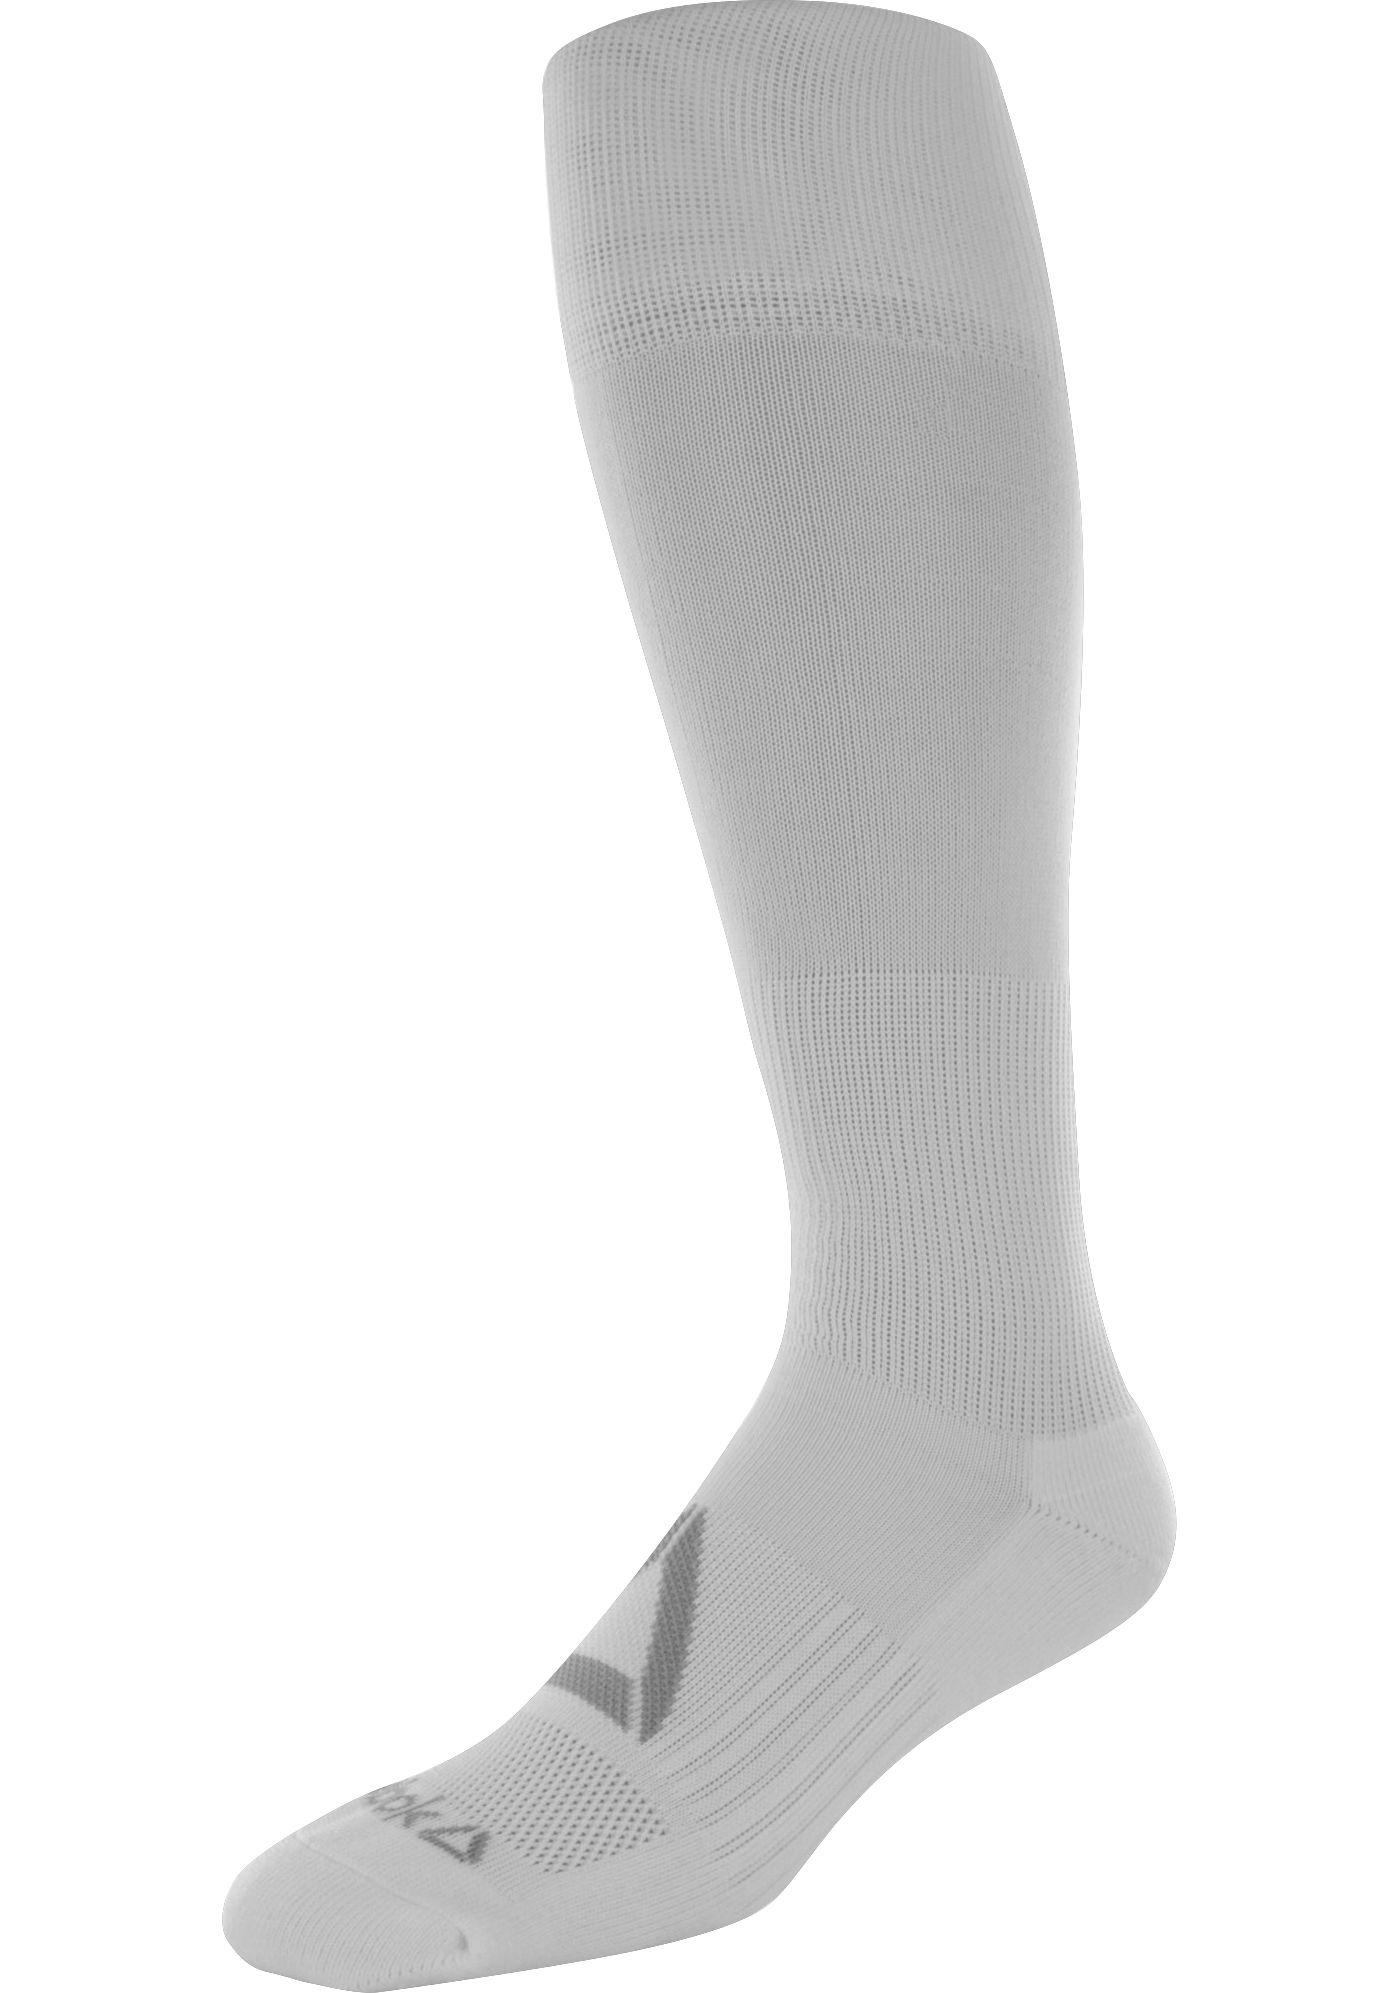 Reebok All Sport Athletic Over the Calf Socks